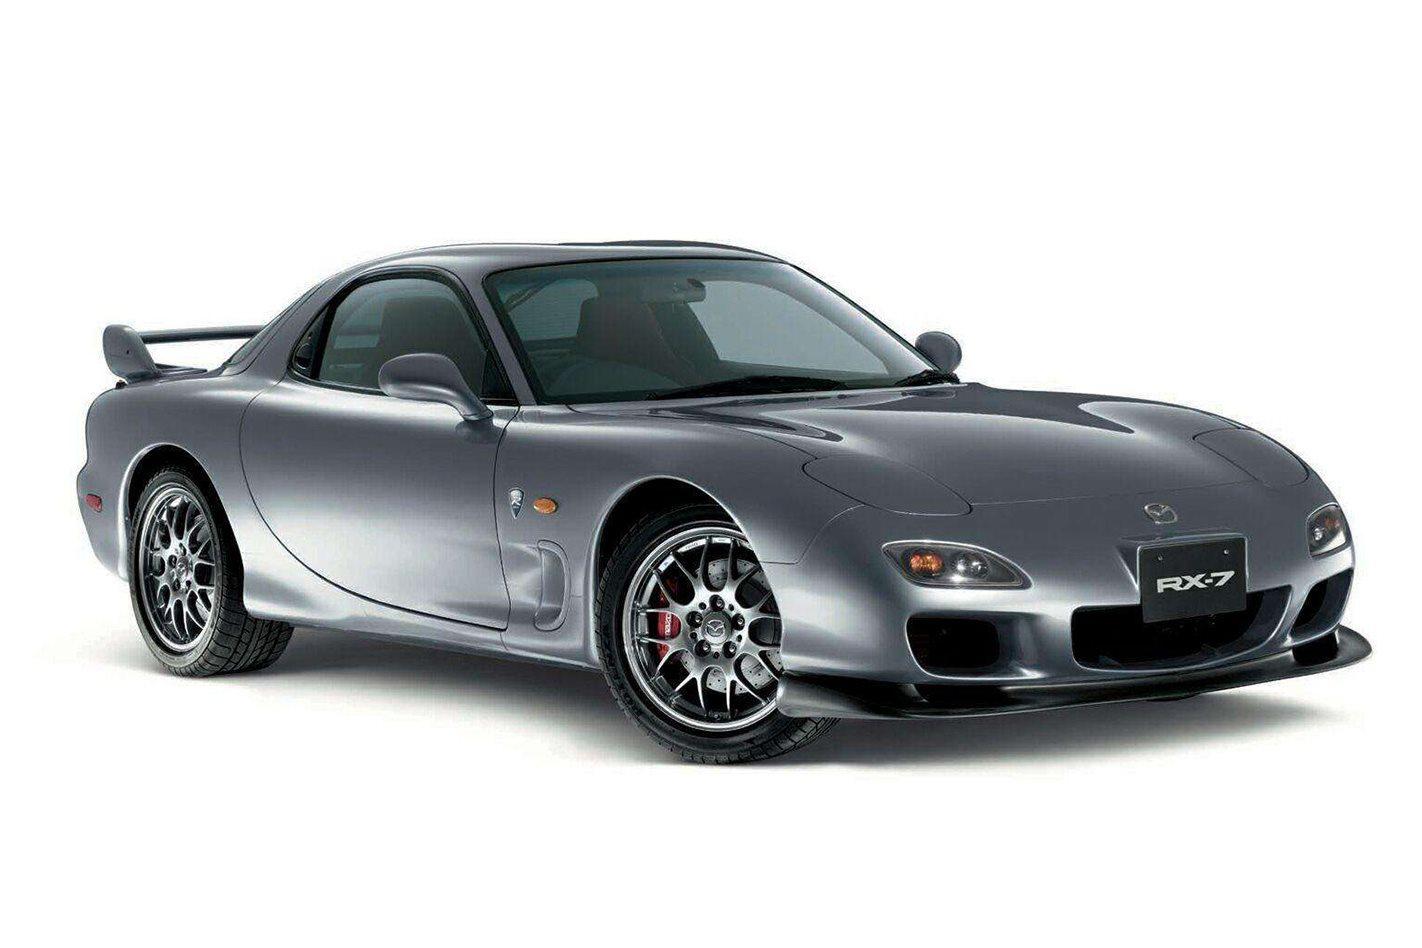 2002-Mazda-RX-7-Spirit-R.jpg